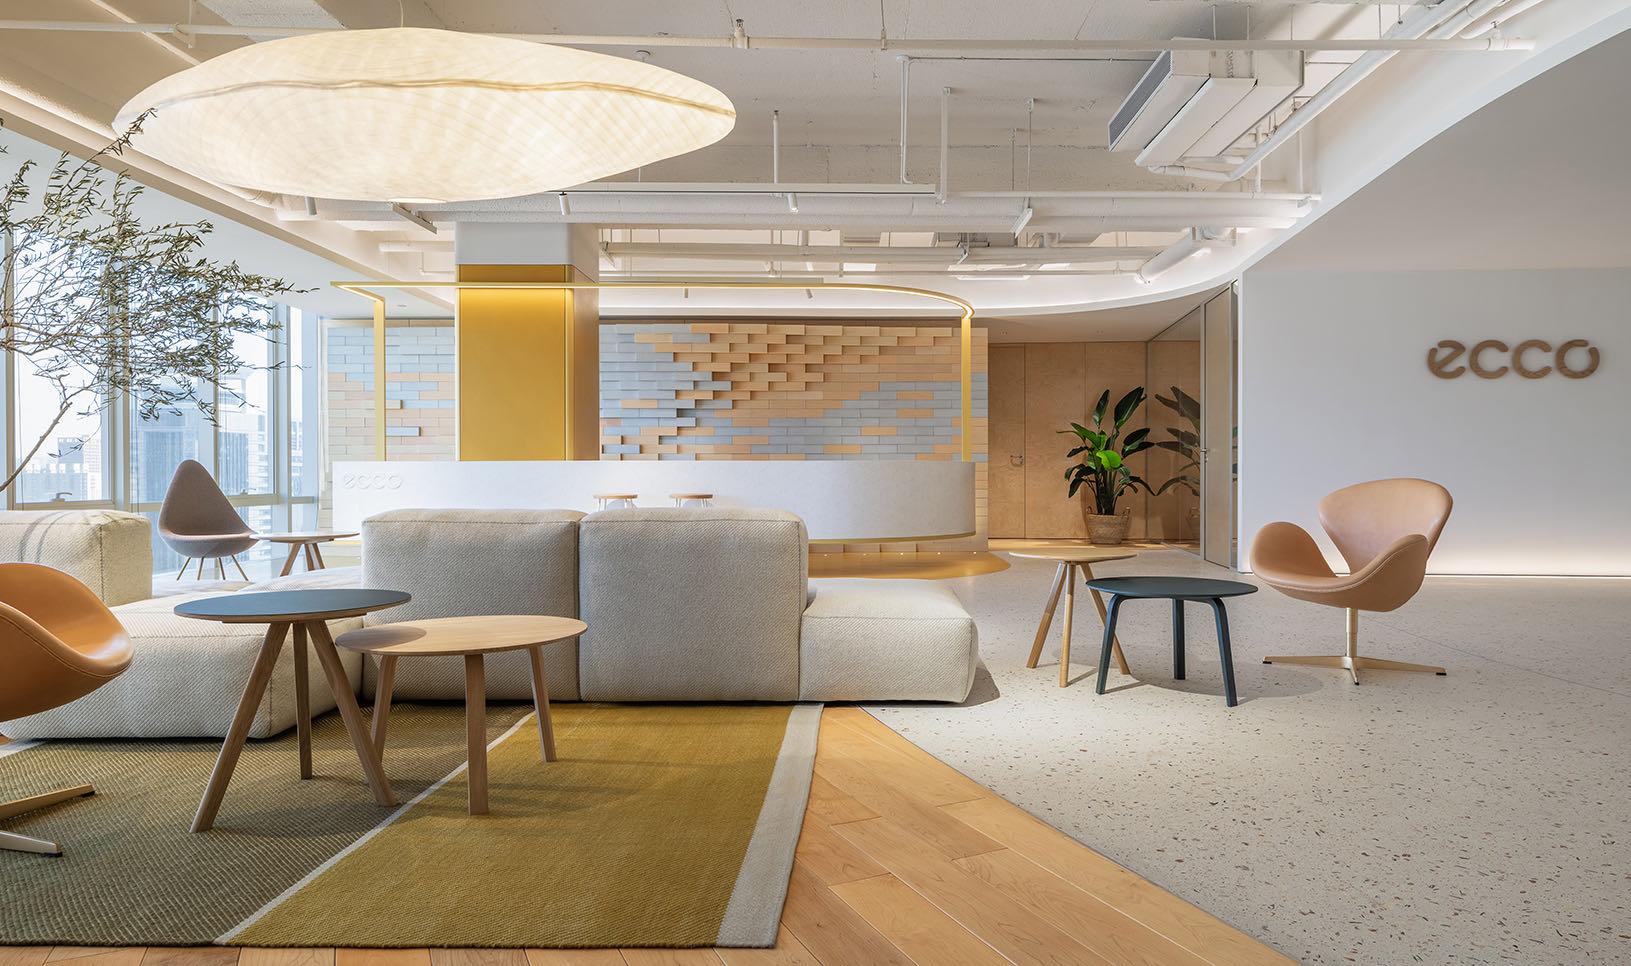 A Look Inside ECCO's Sleek New Xi'an Office